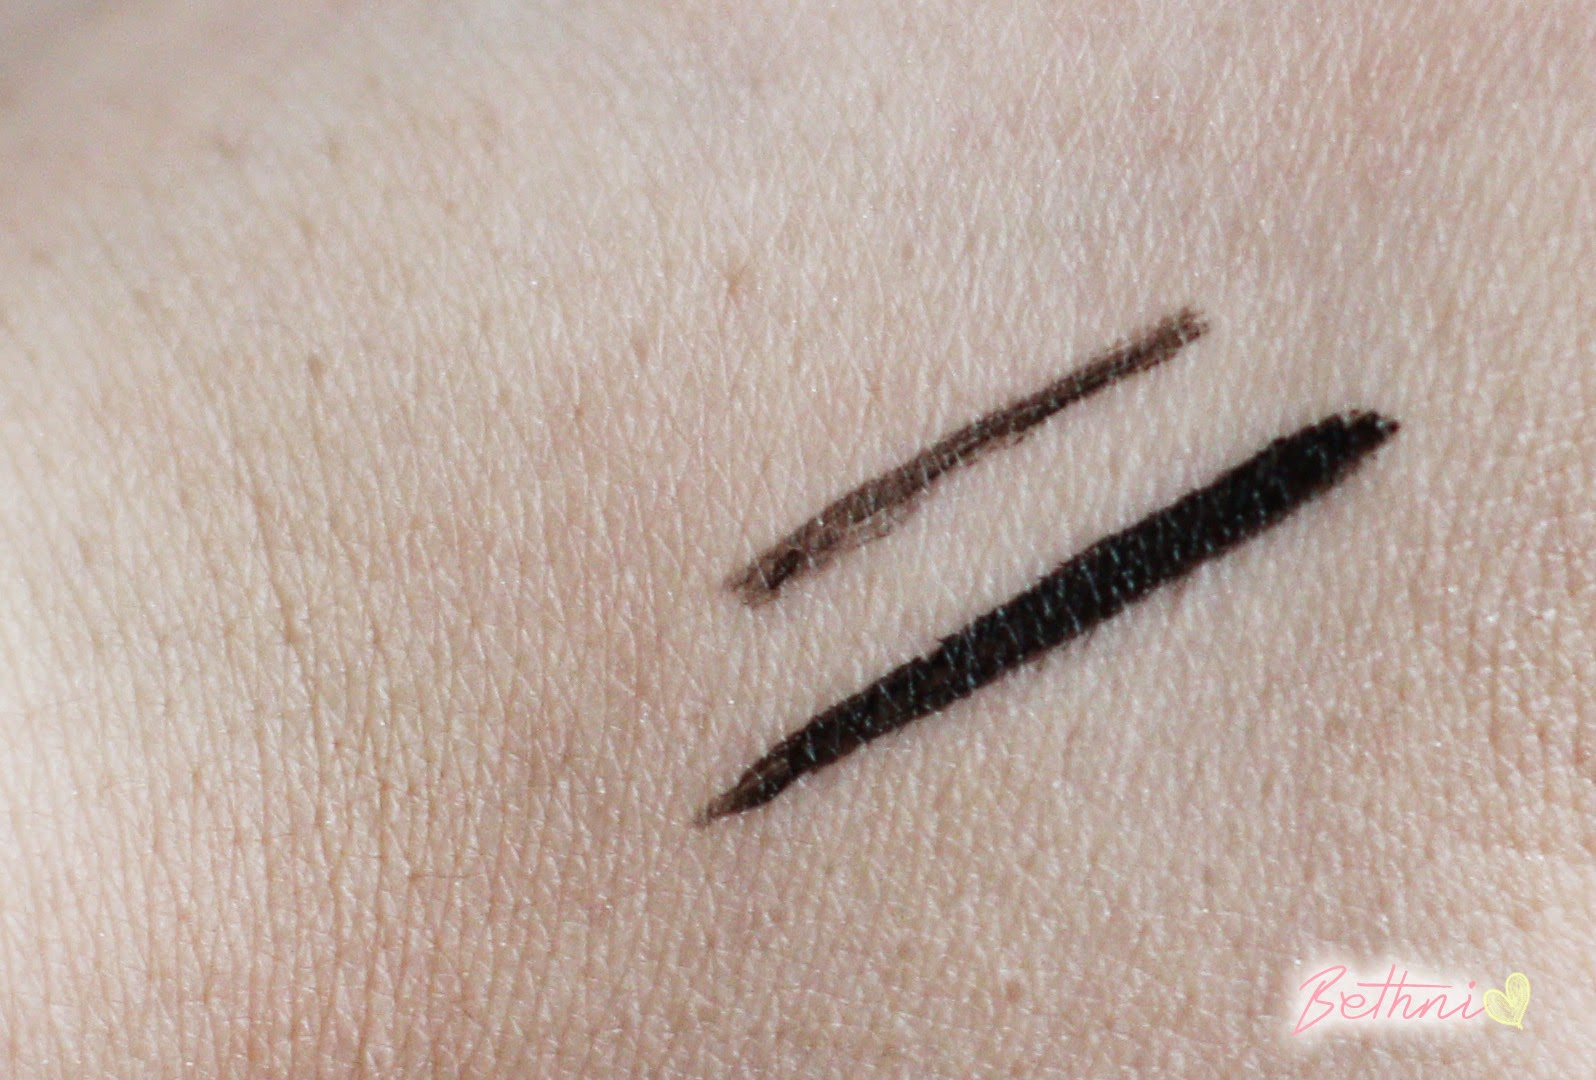 Zoeva Cat Eye Pen Lasting Stylo Liner  Swatch